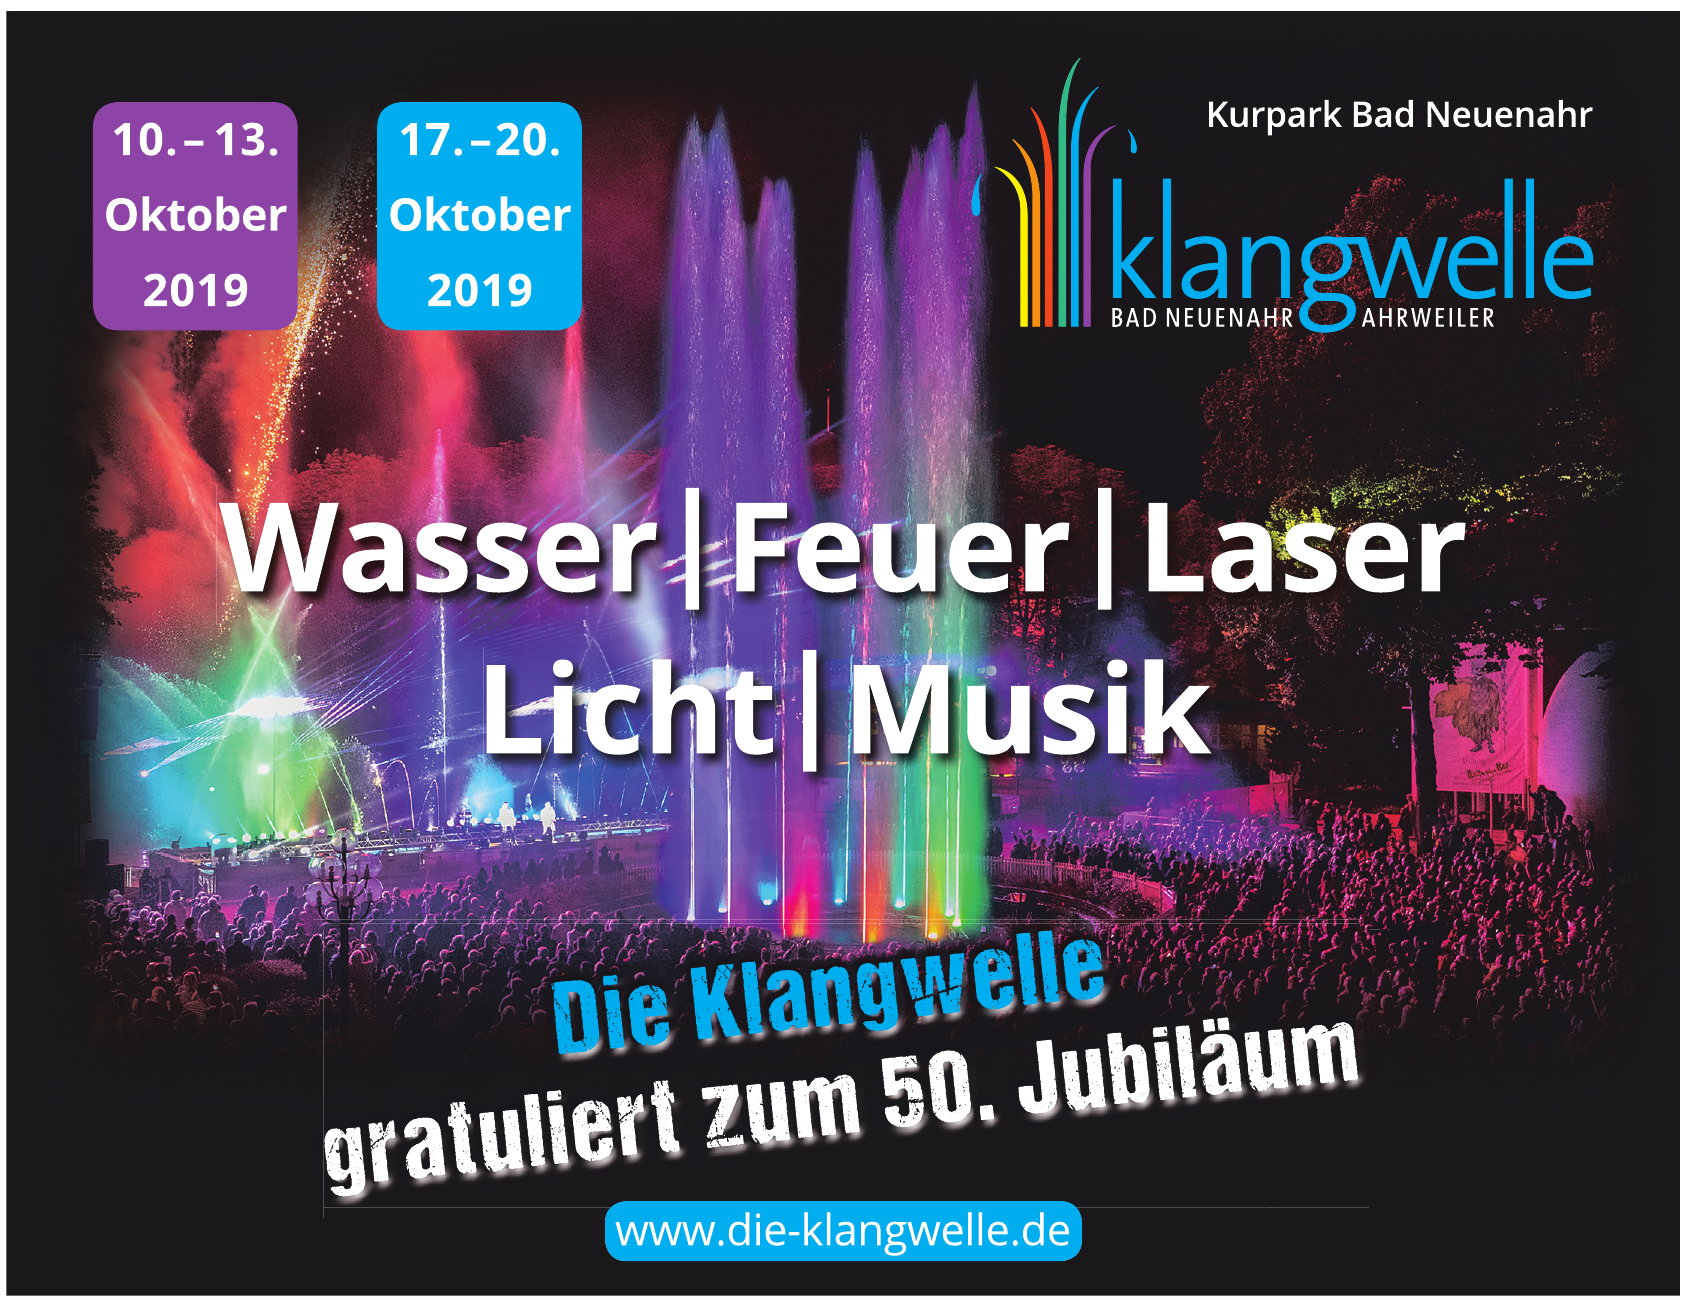 Klangwelle Bad Neuenahr-Ahrweiler